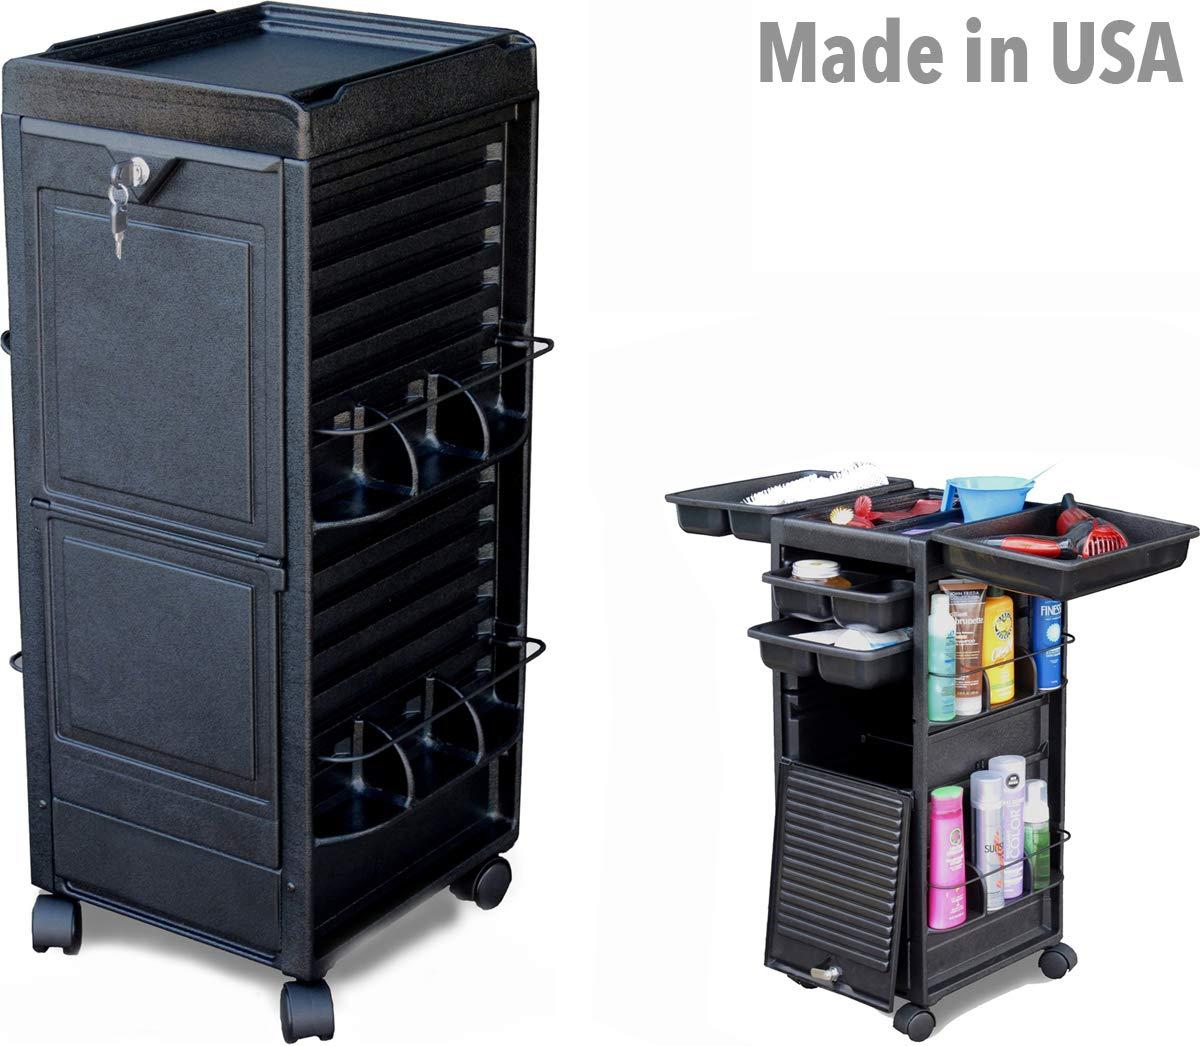 N20-P-Prime Salon Roll-About Cart Trolley w/Locking Door Made in USA Dina Meri